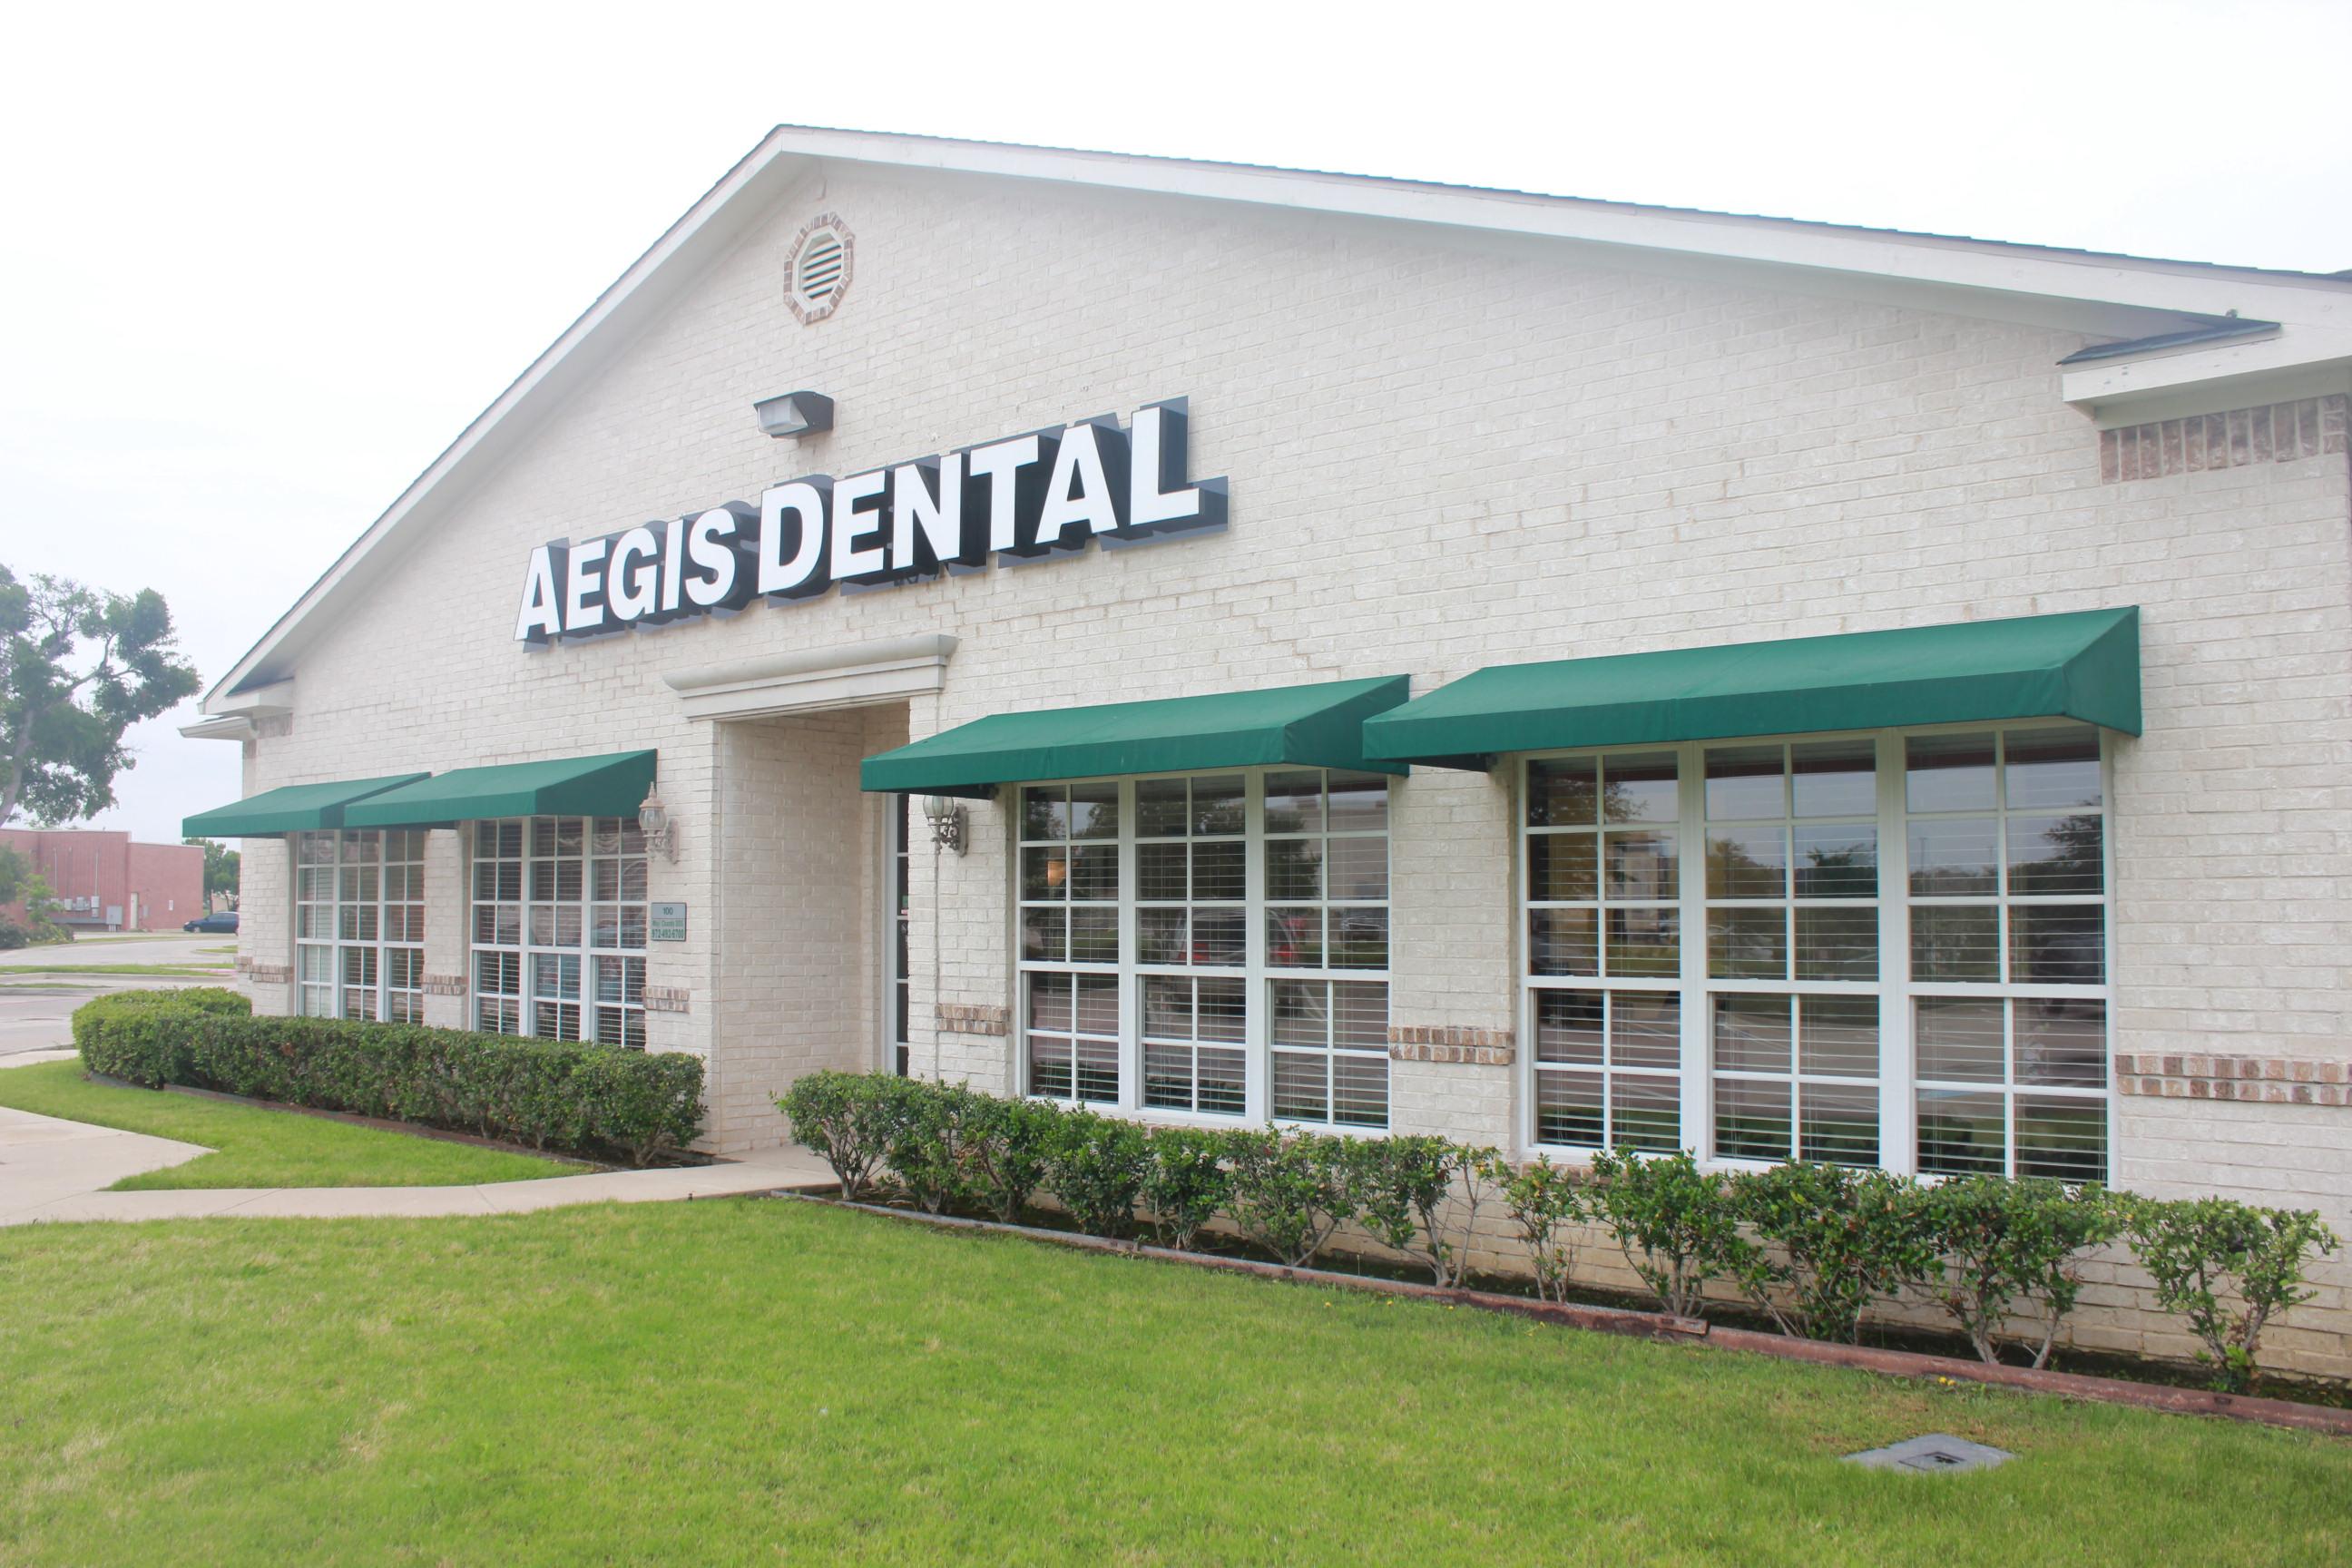 Aegis Dental image 1